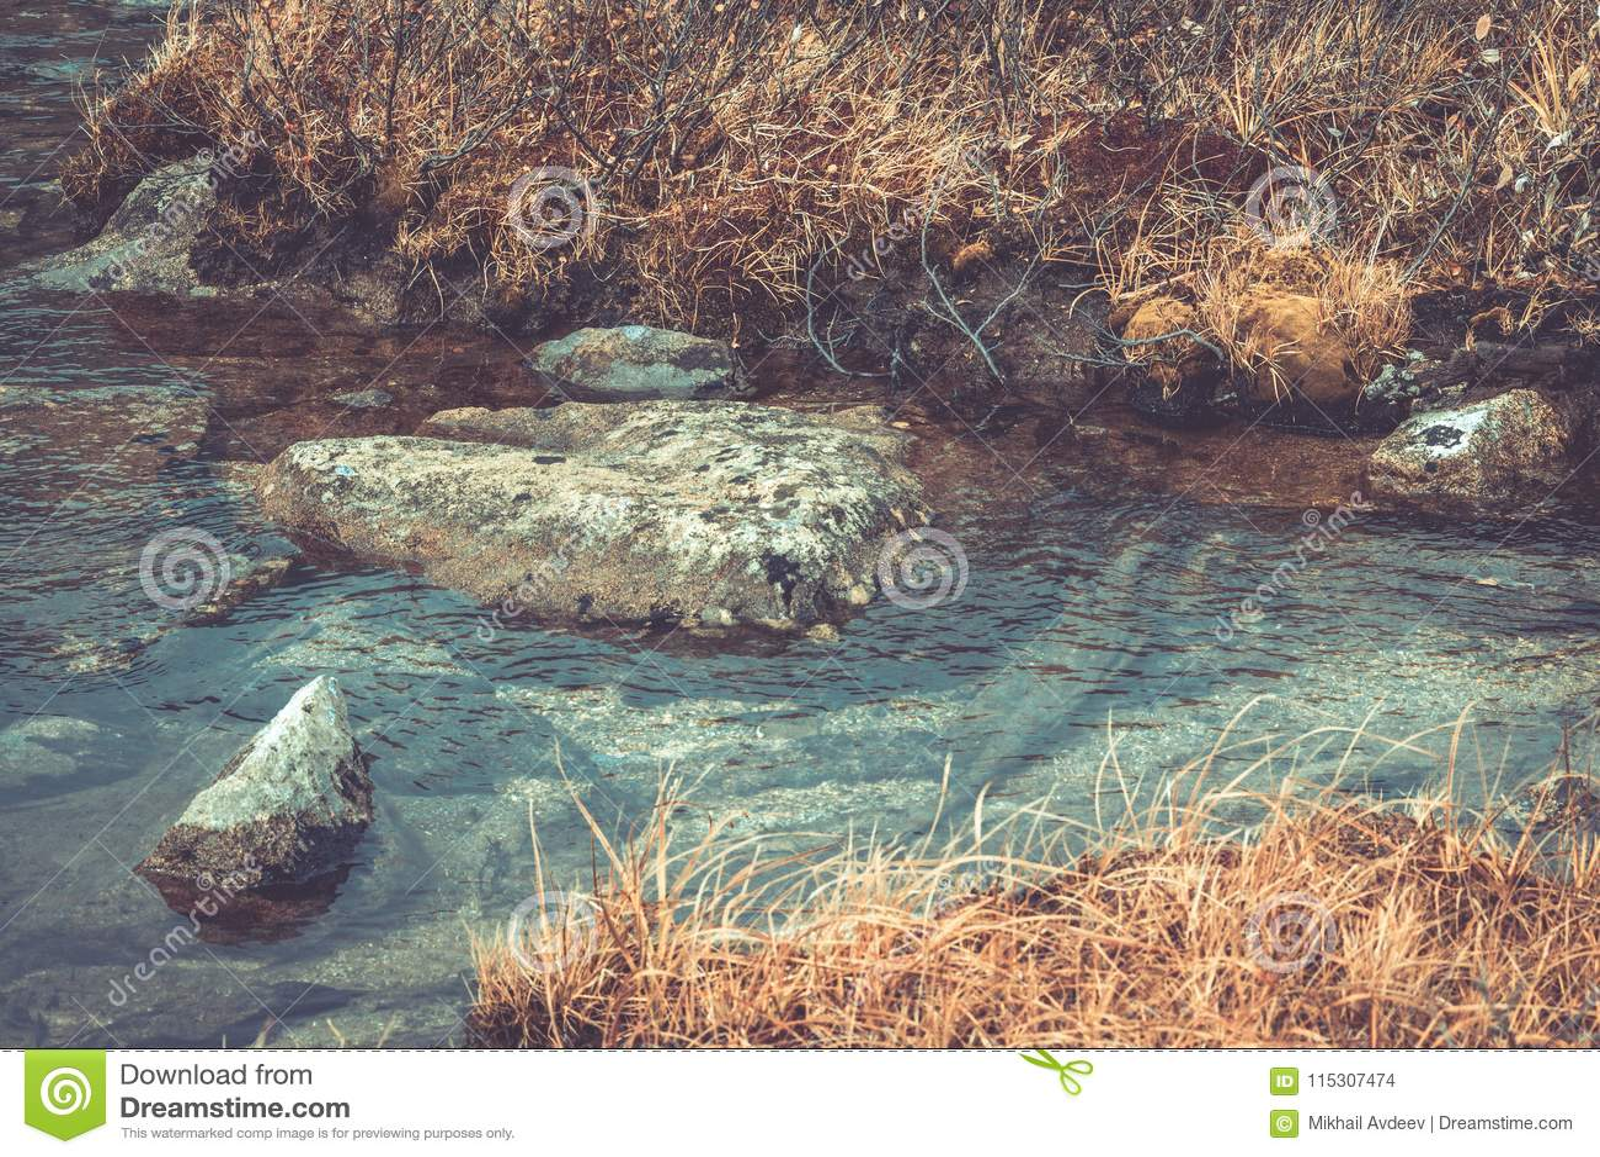 Mountain stream in the rocks